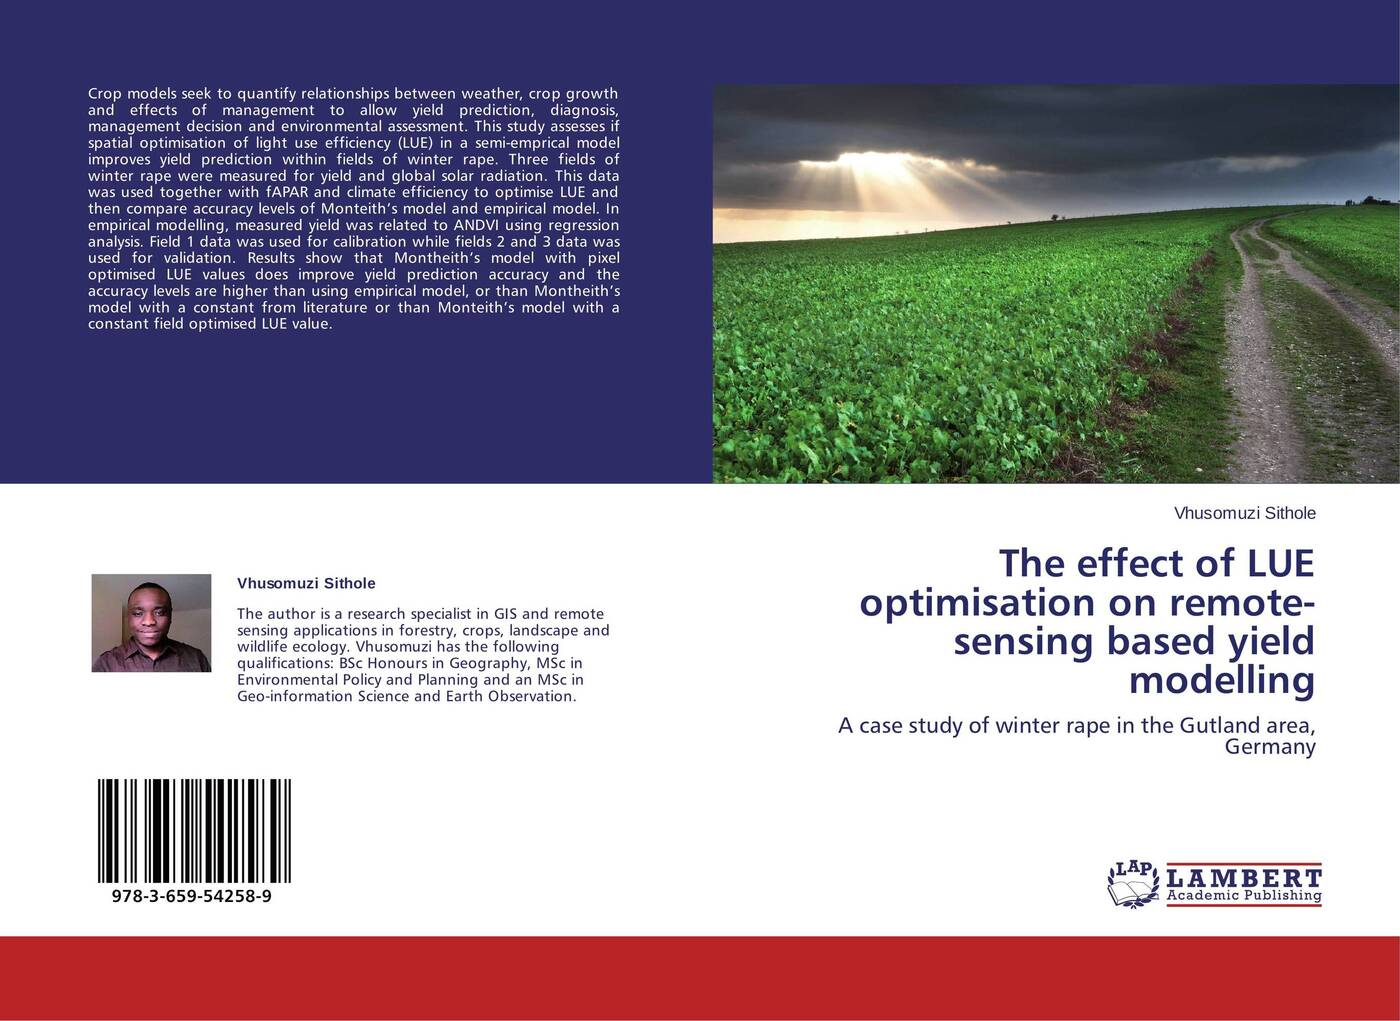 Vhusomuzi Sithole The effect of LUE optimisation on remote-sensing based yield modelling integral management and governance empirical findings of mer model